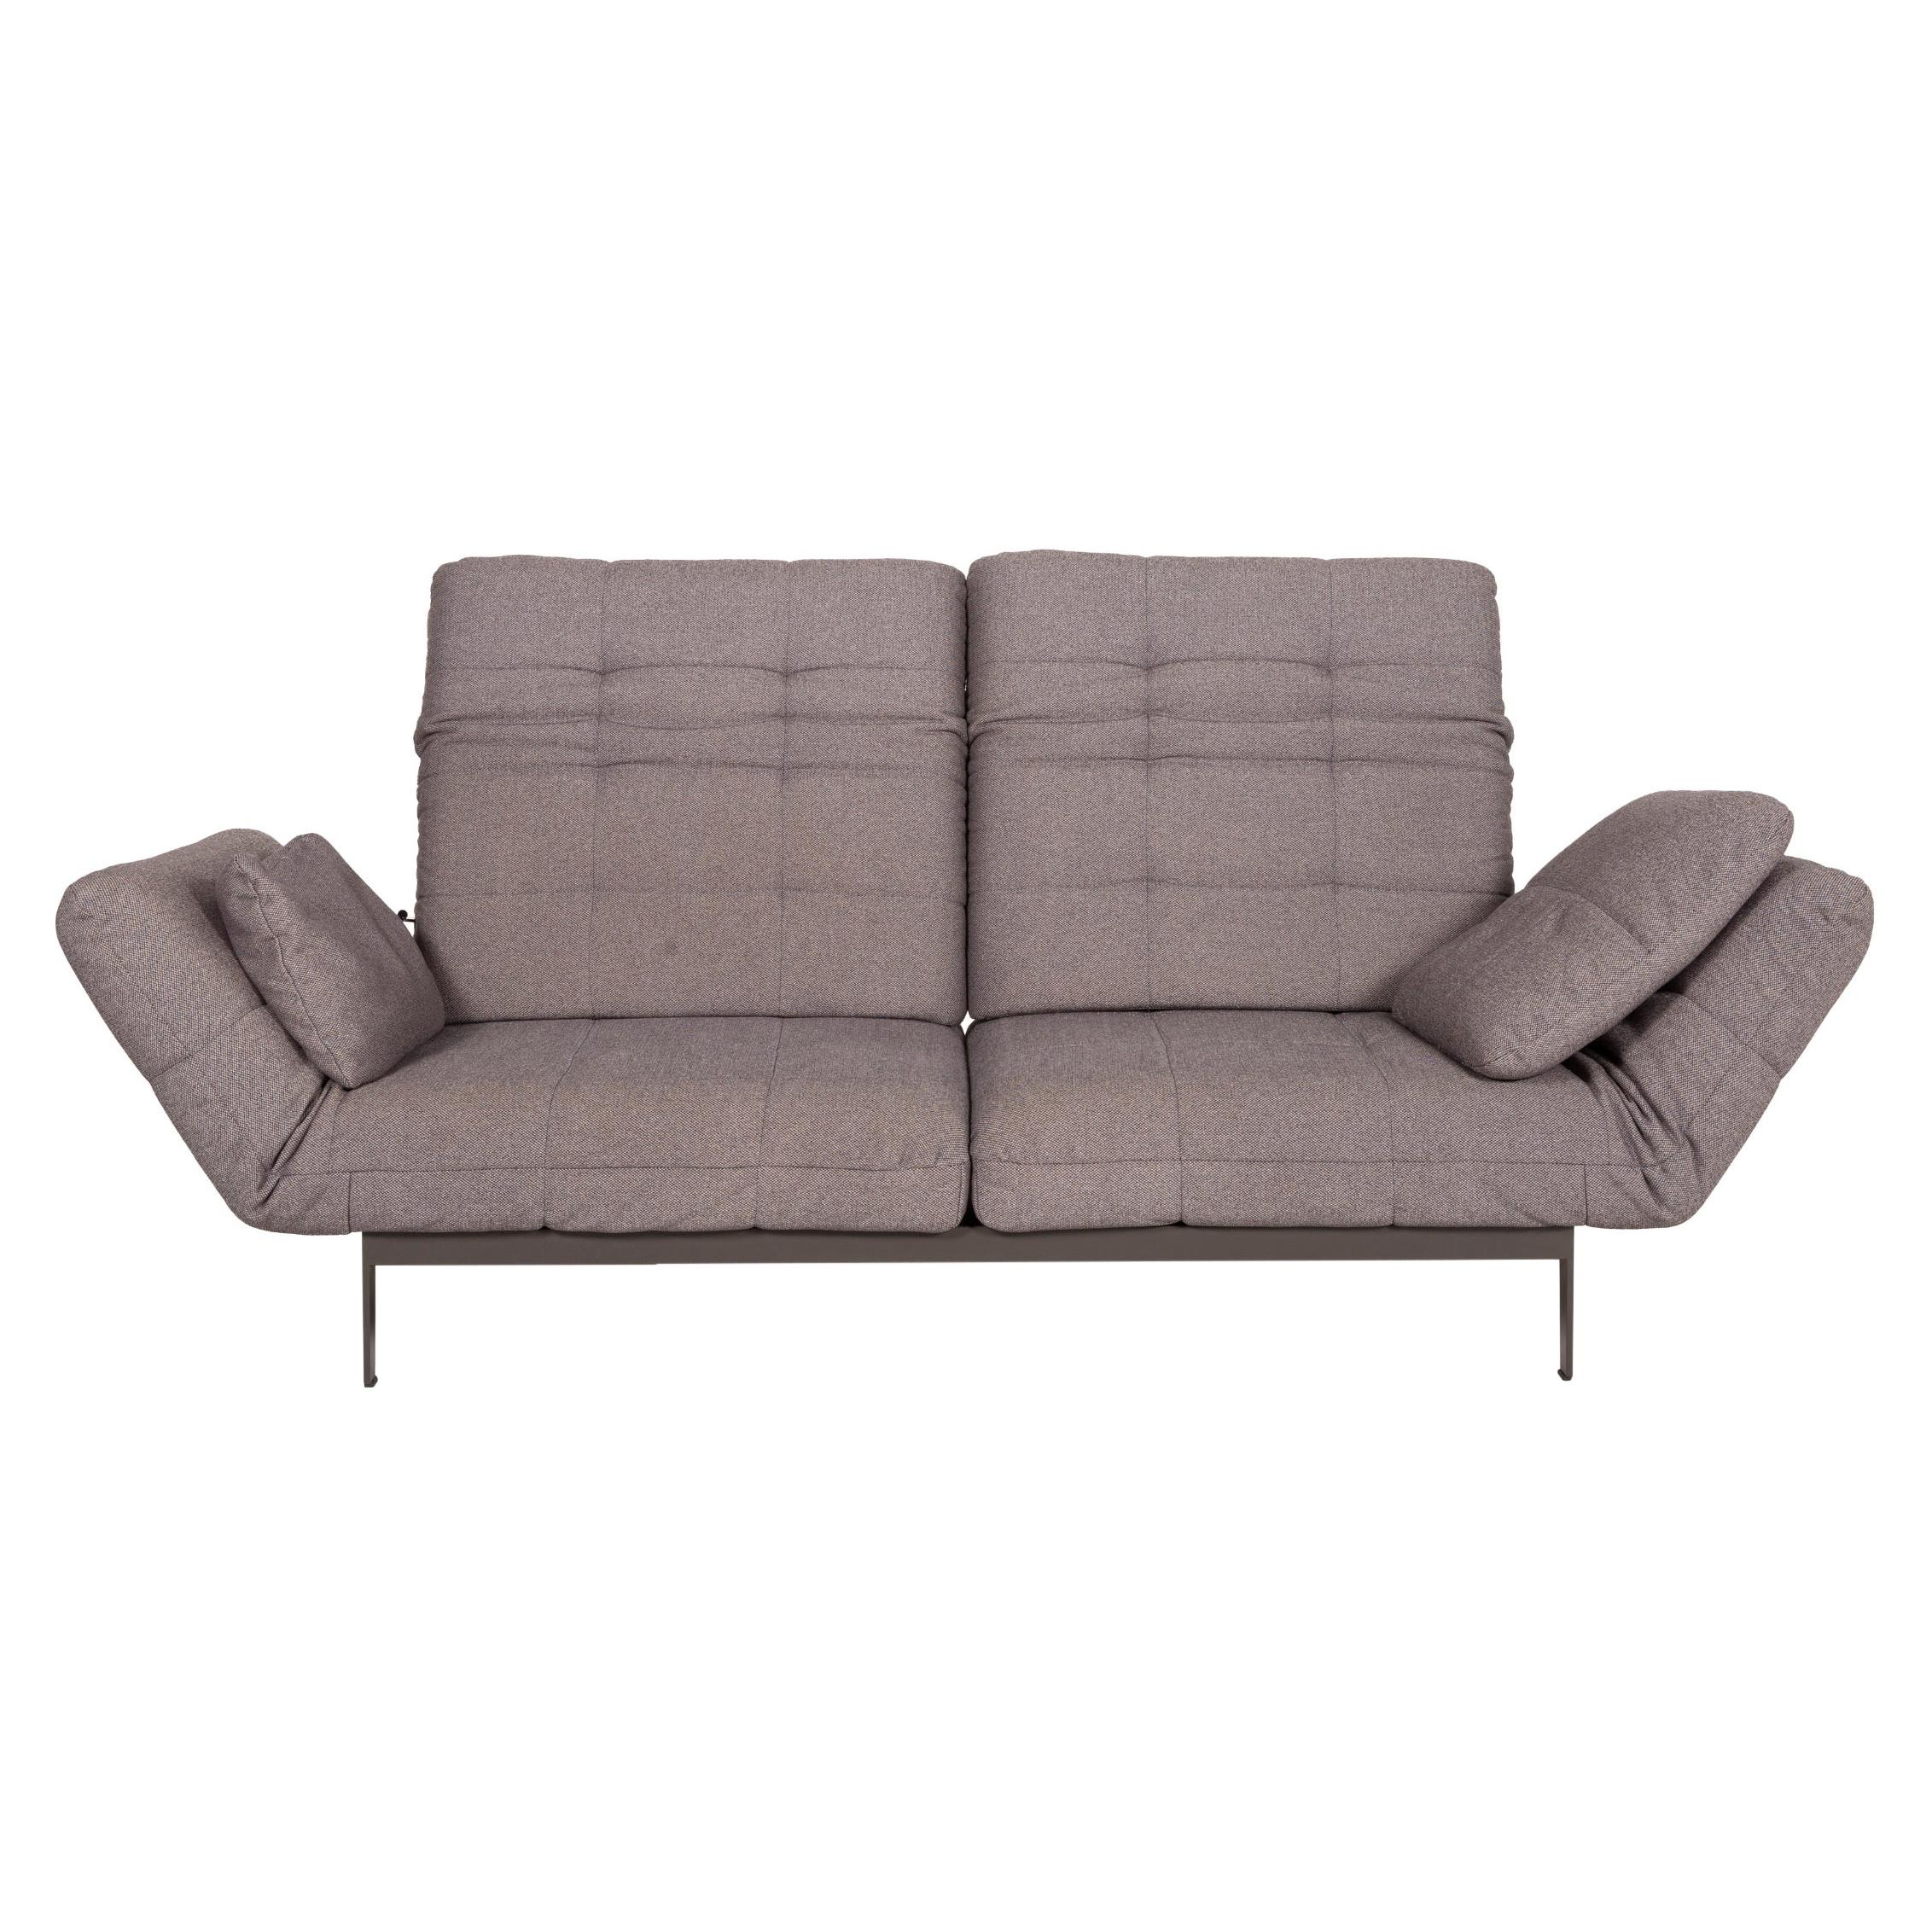 Rolf Benz Mera Fabric Sofa Two-Seater Sofa Fabric Gray Function